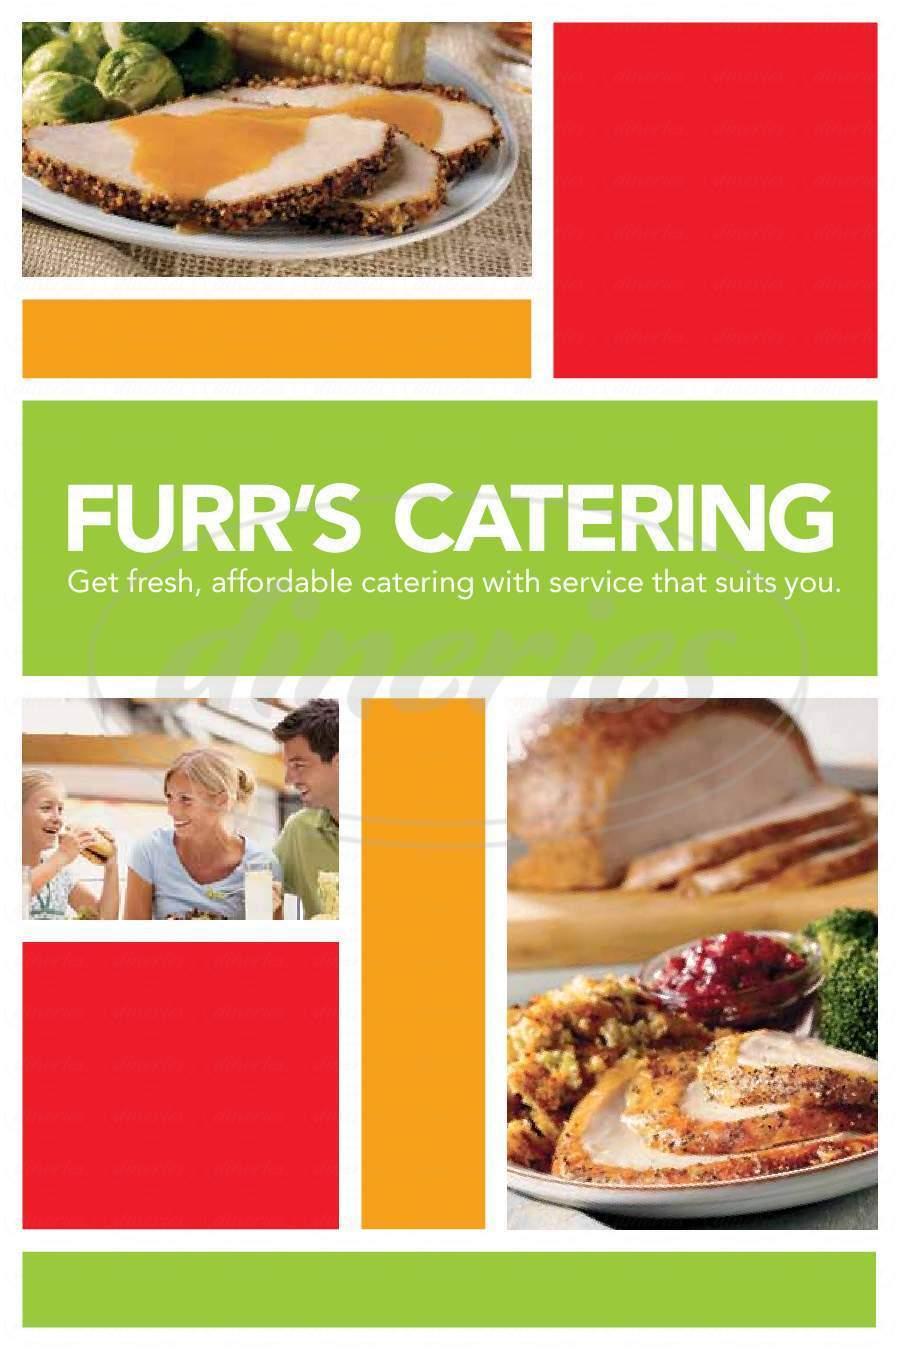 menu for Furr's